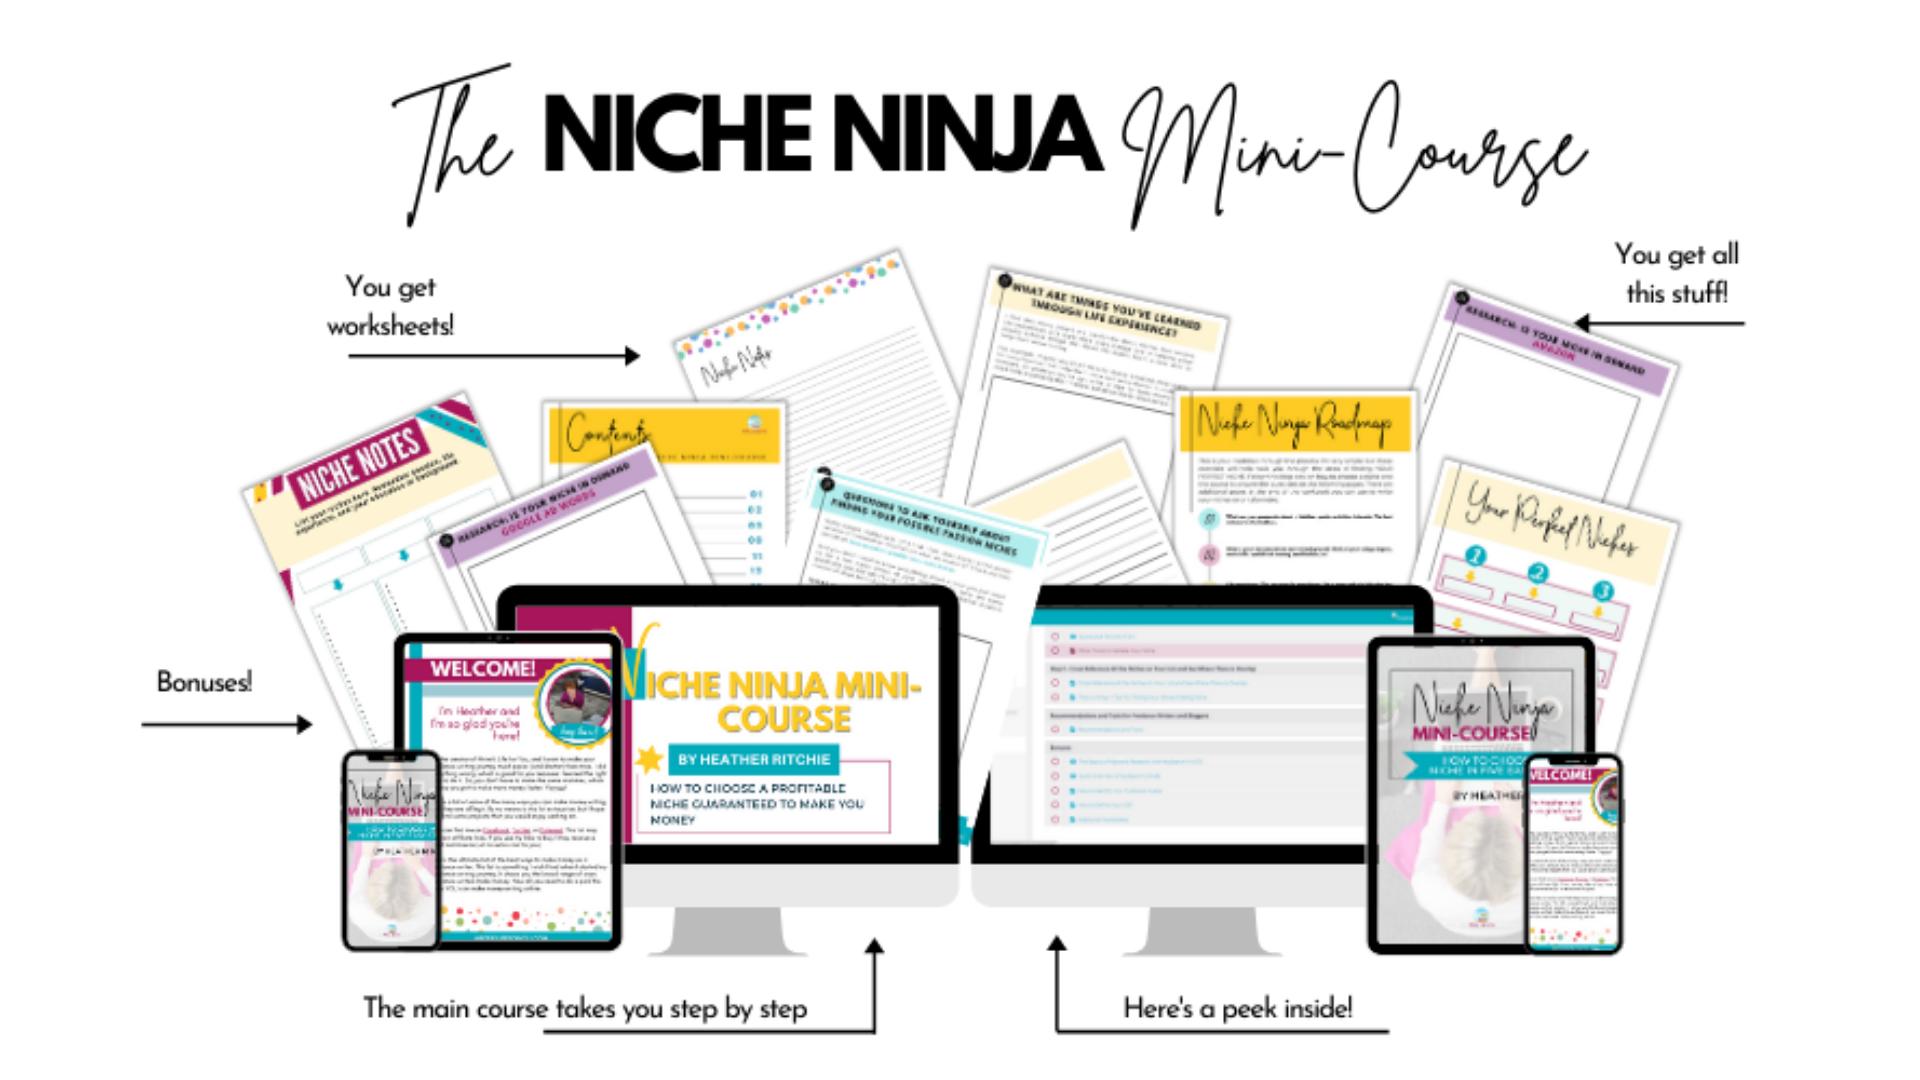 Niche Ninja Mini-Course workbook and course